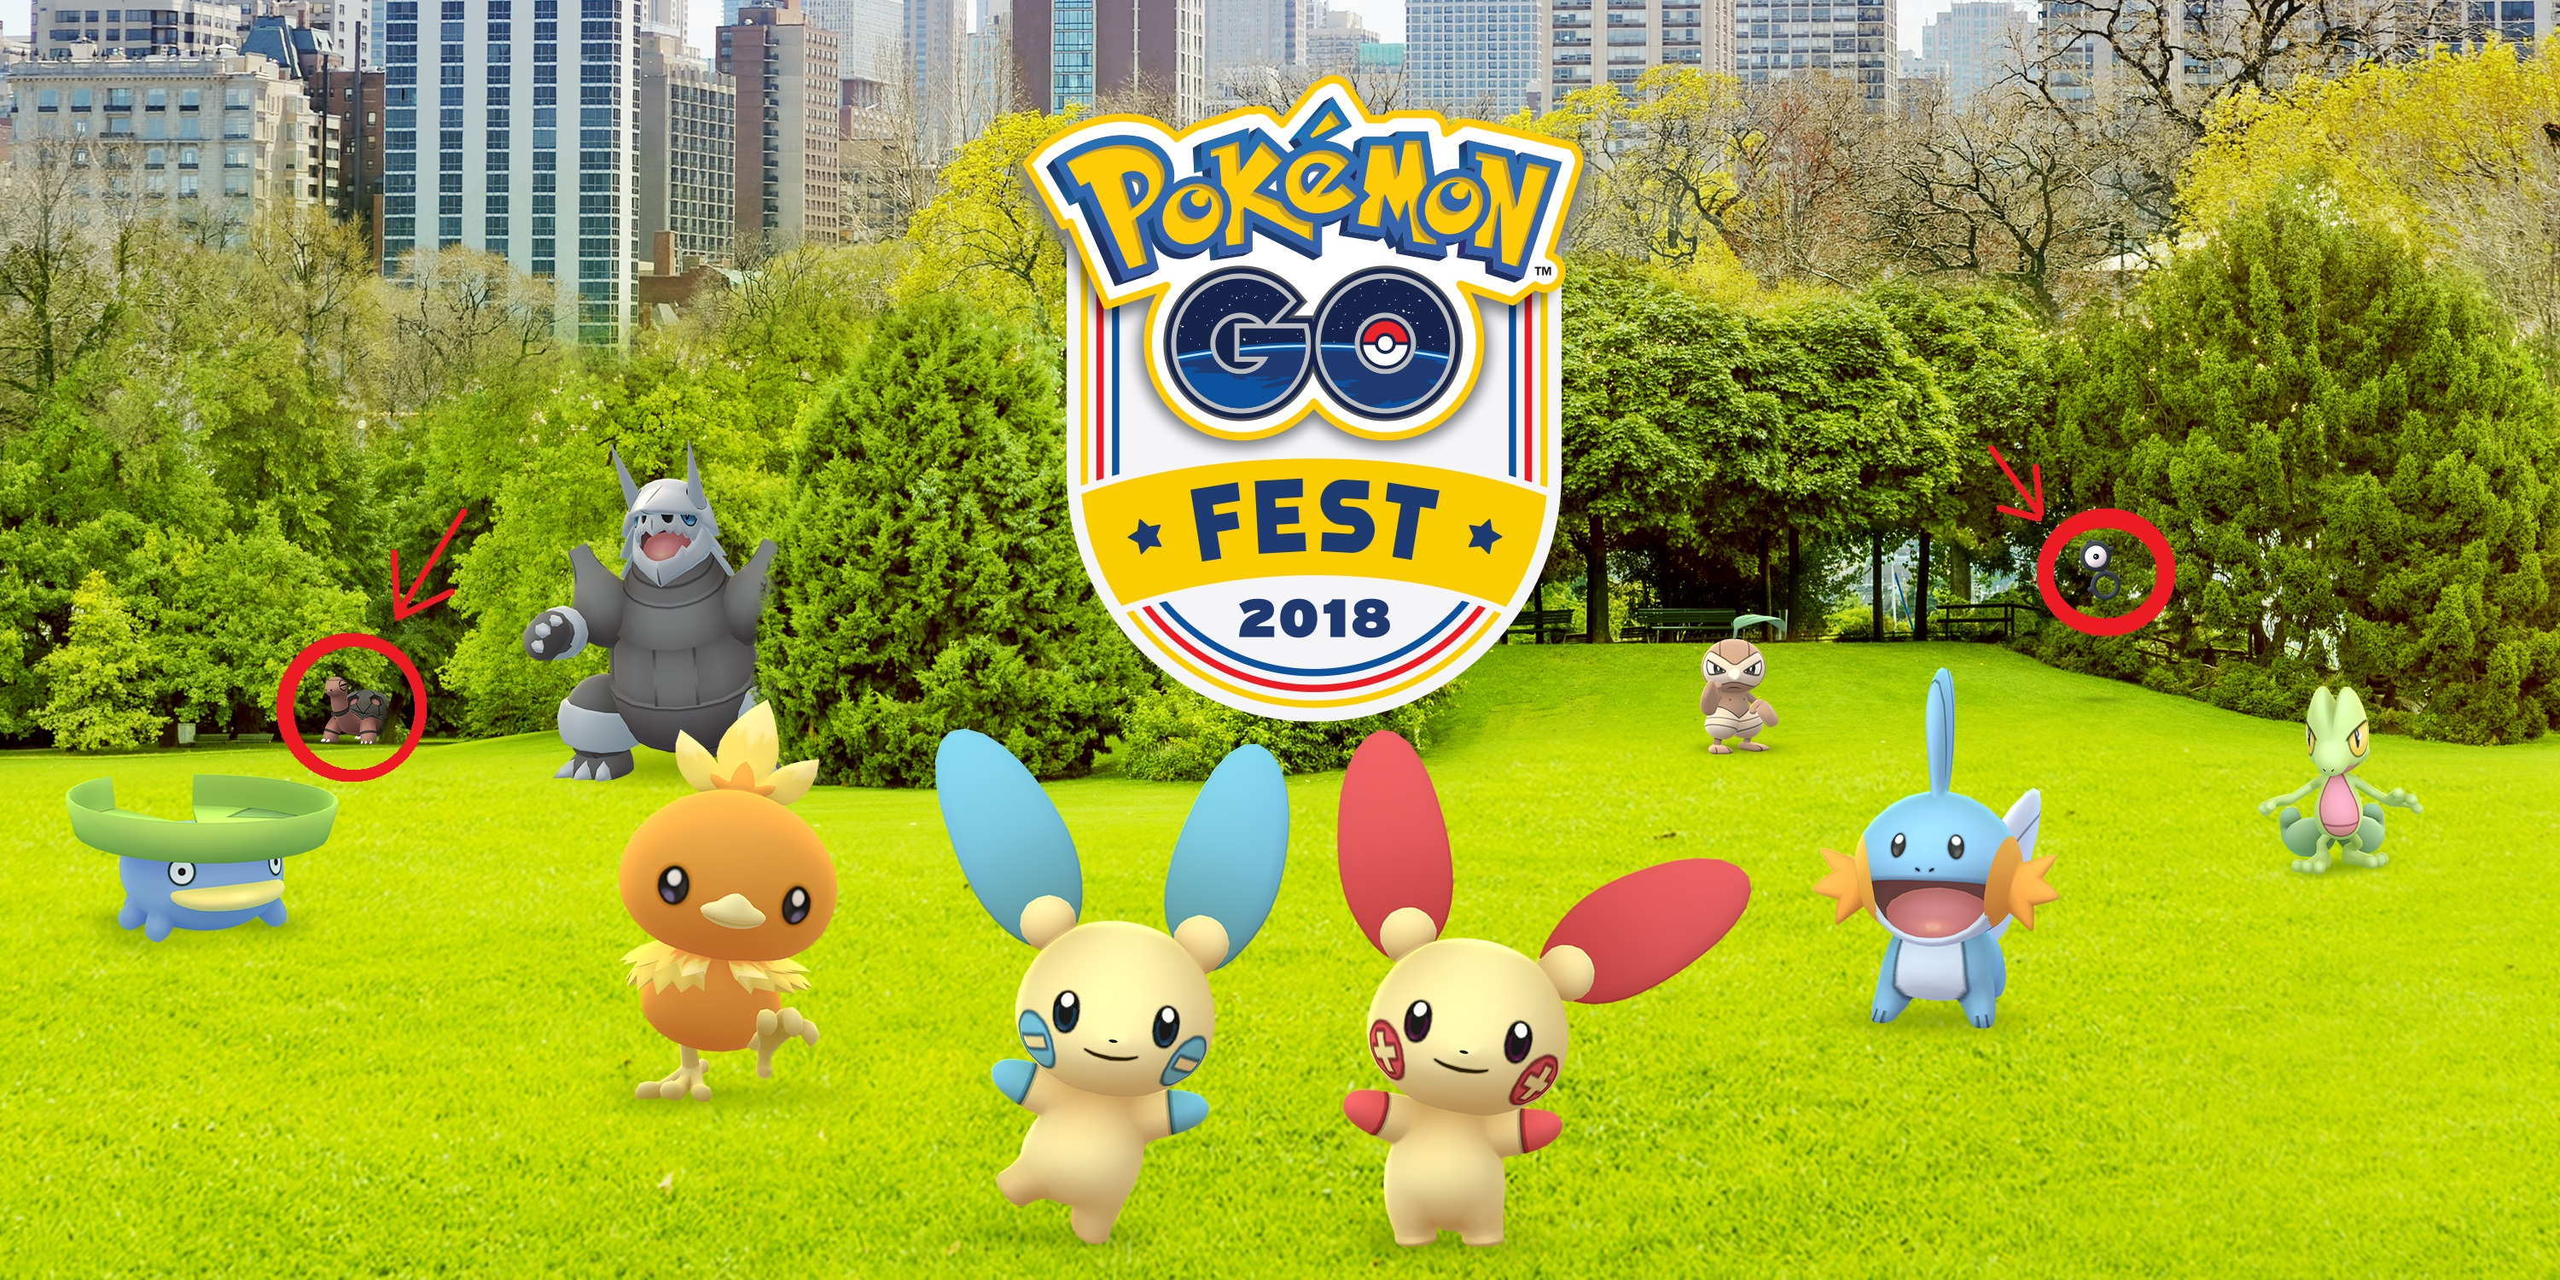 Niantic 'horrified' by Pokémon Go Fest - Polygon